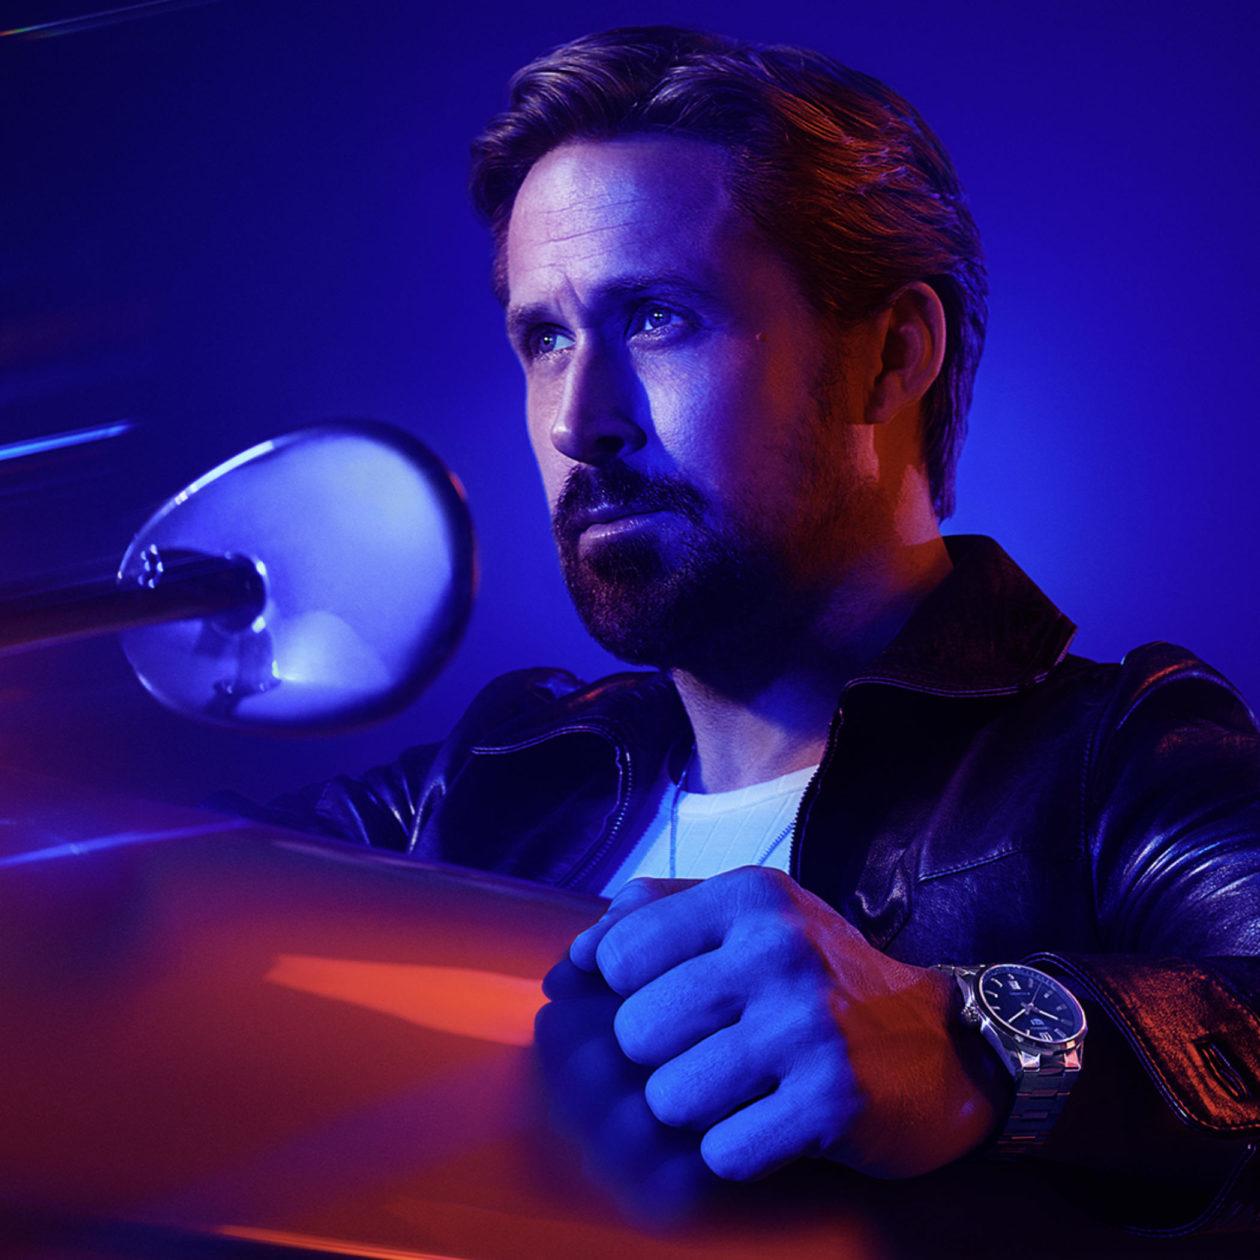 Ryan Gosling nowym ambasadorem marki TAG Heuer